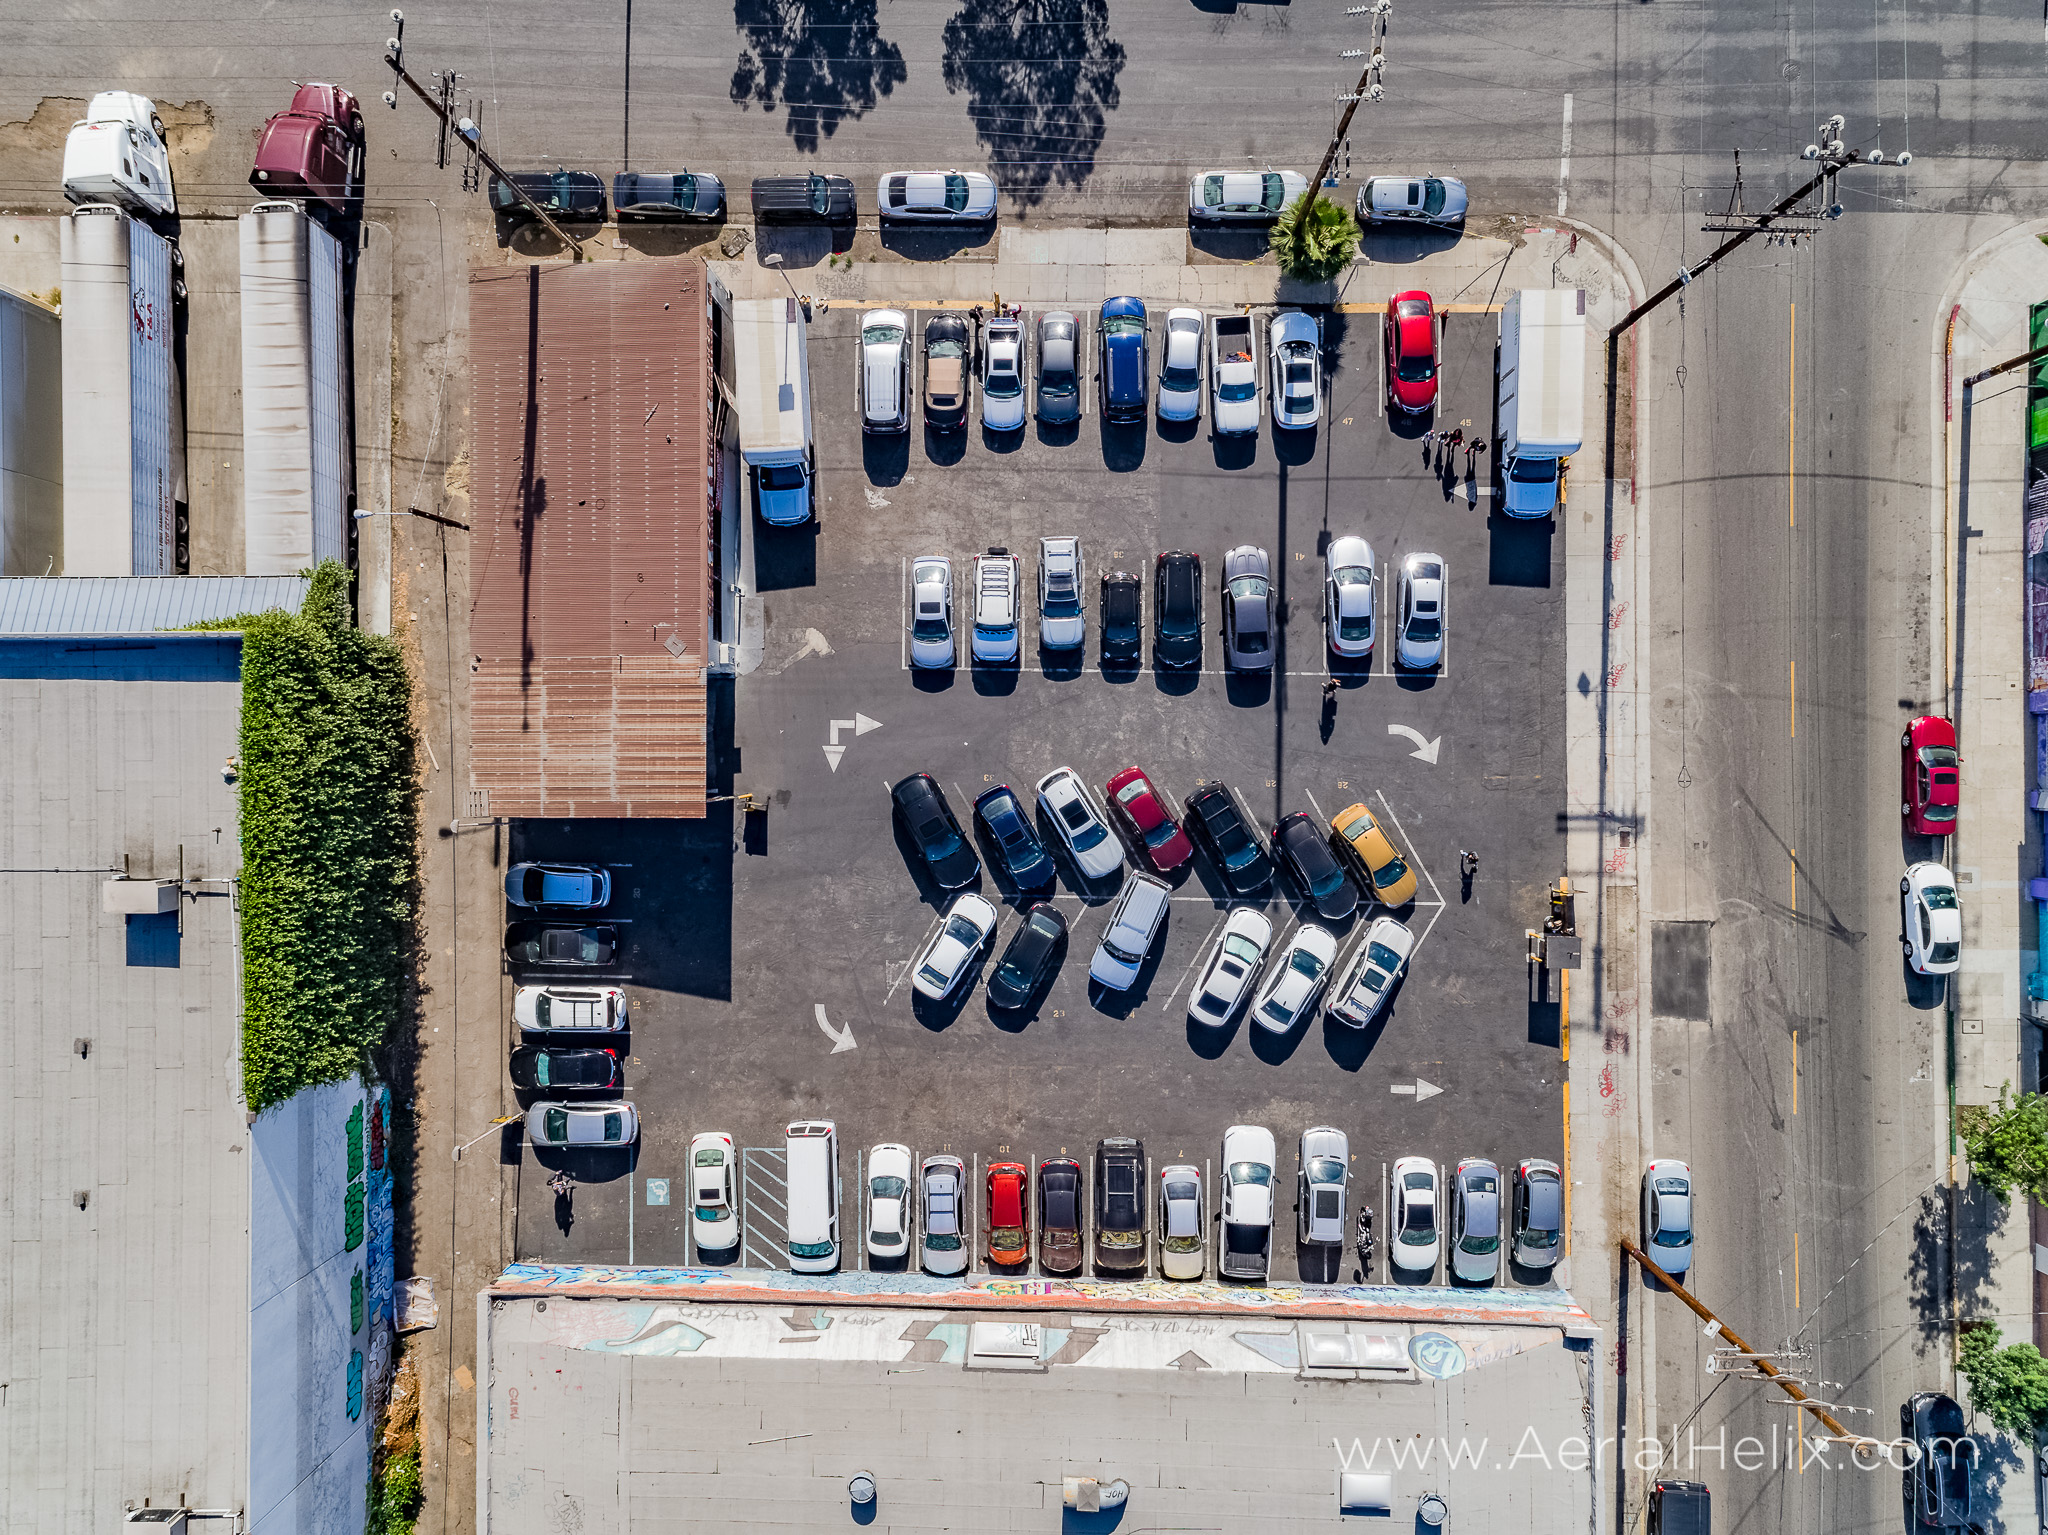 Perfect Parking 2 aerial photographer-22.jpg